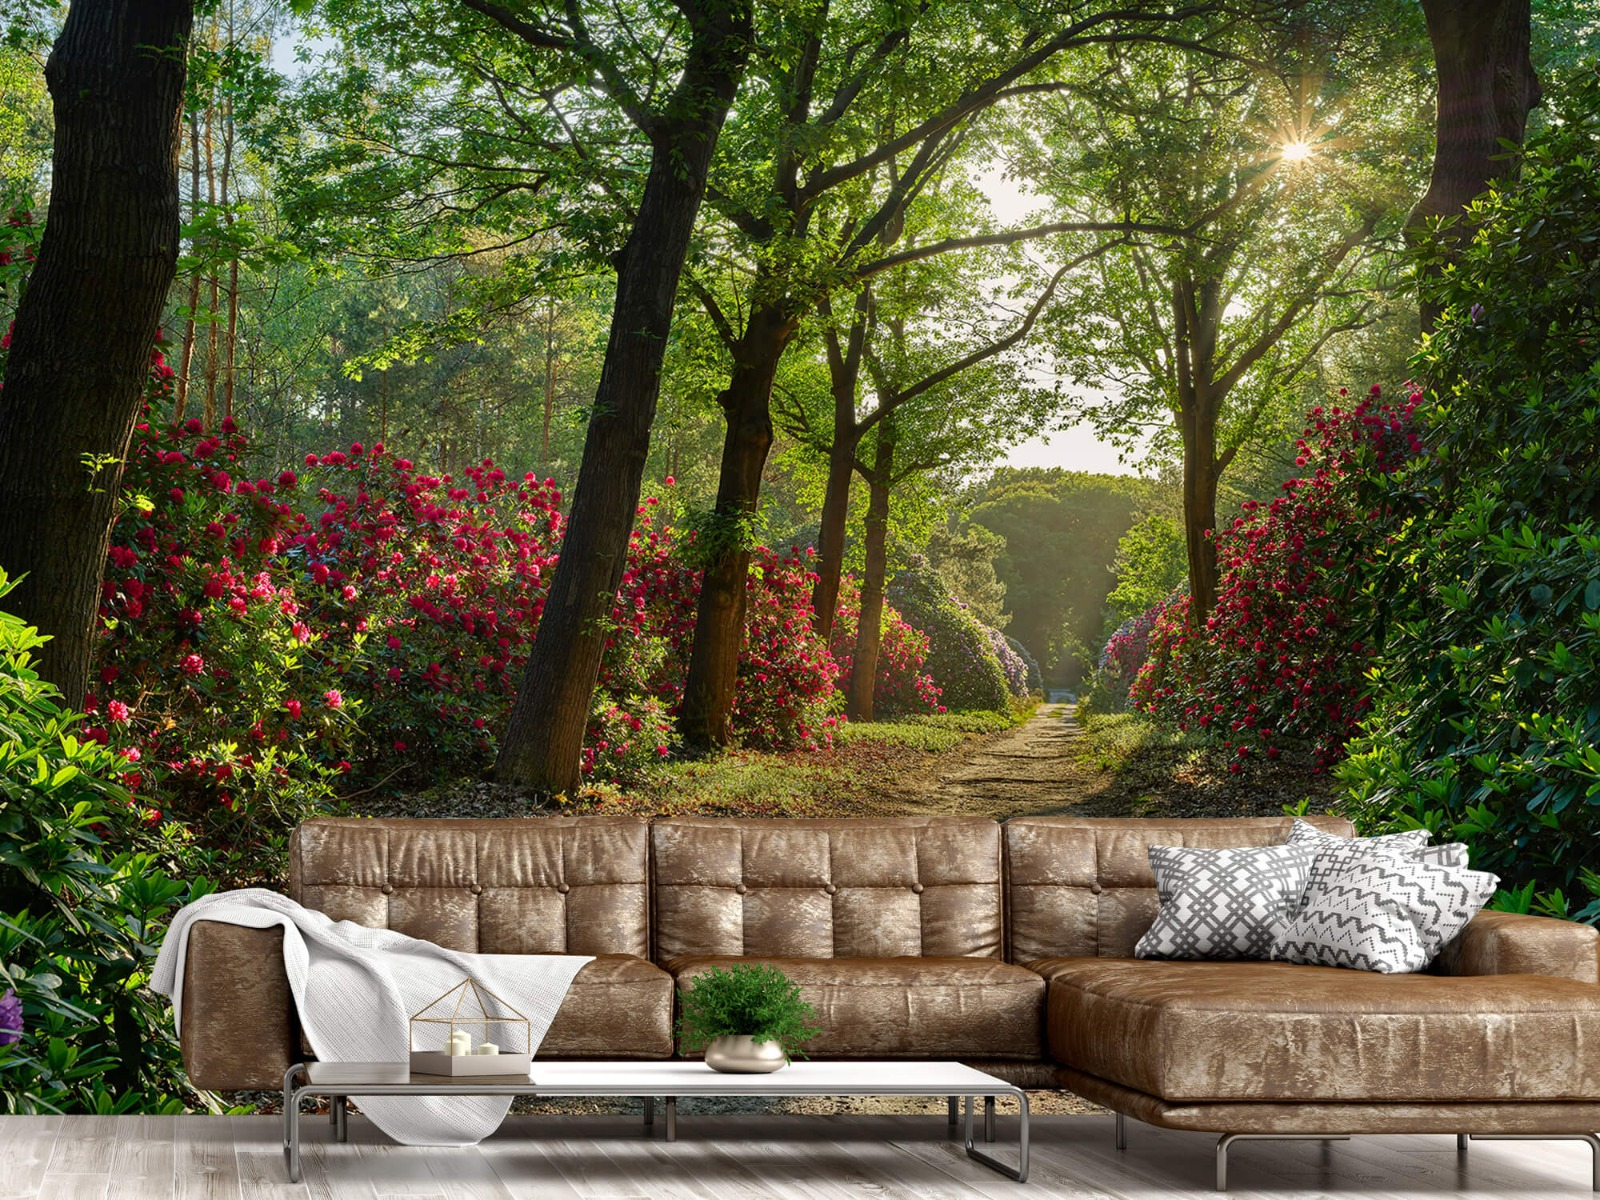 Bos - Zonsopkomst bij pad met rhododendrons 14